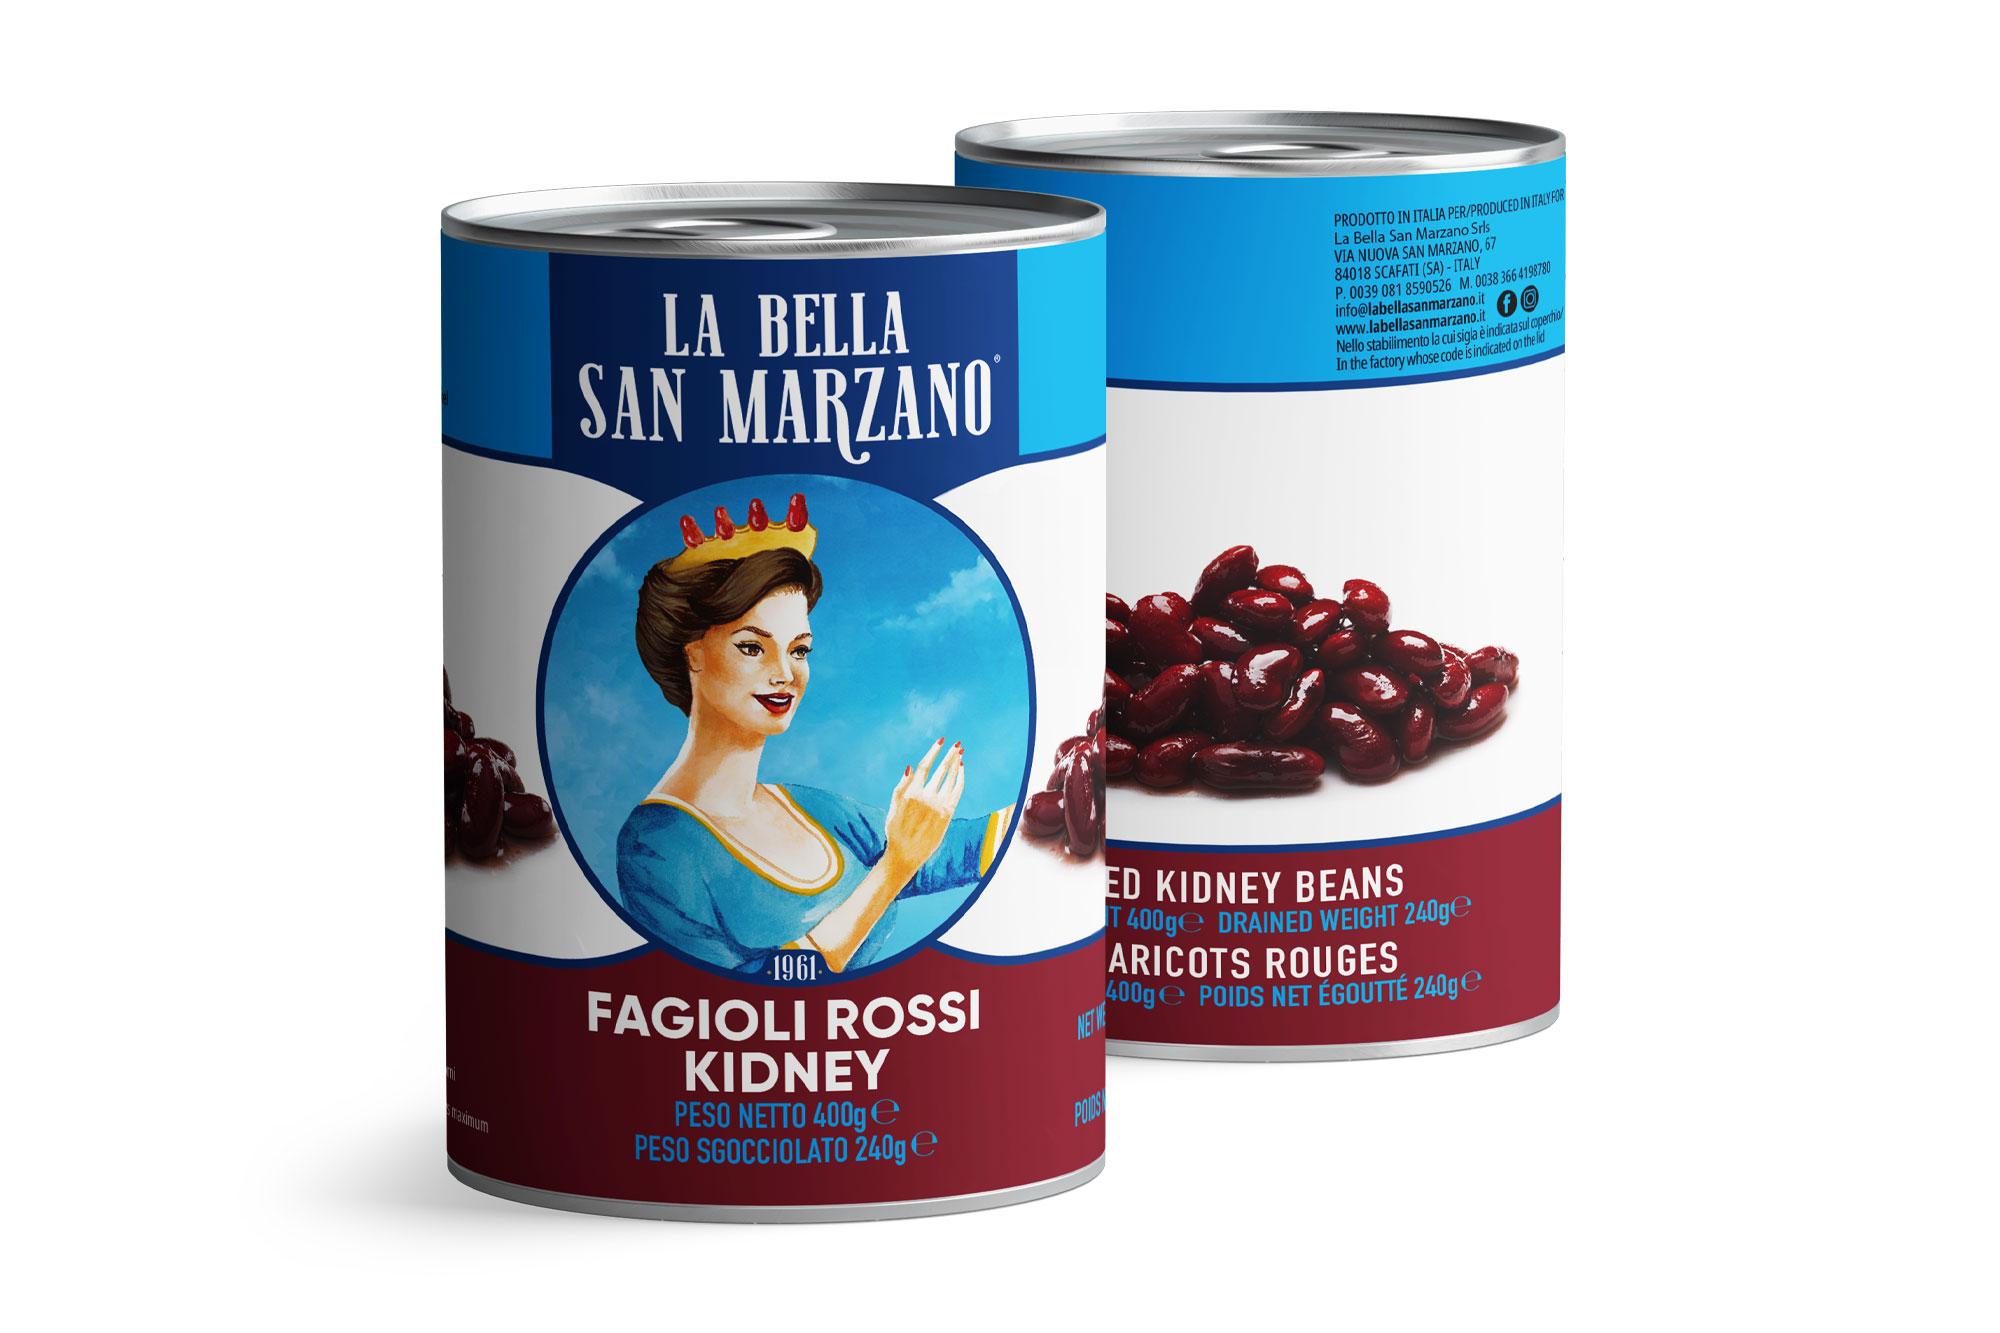 La Bella San Marzano - Fagioli Rossi Kidney 400 gr